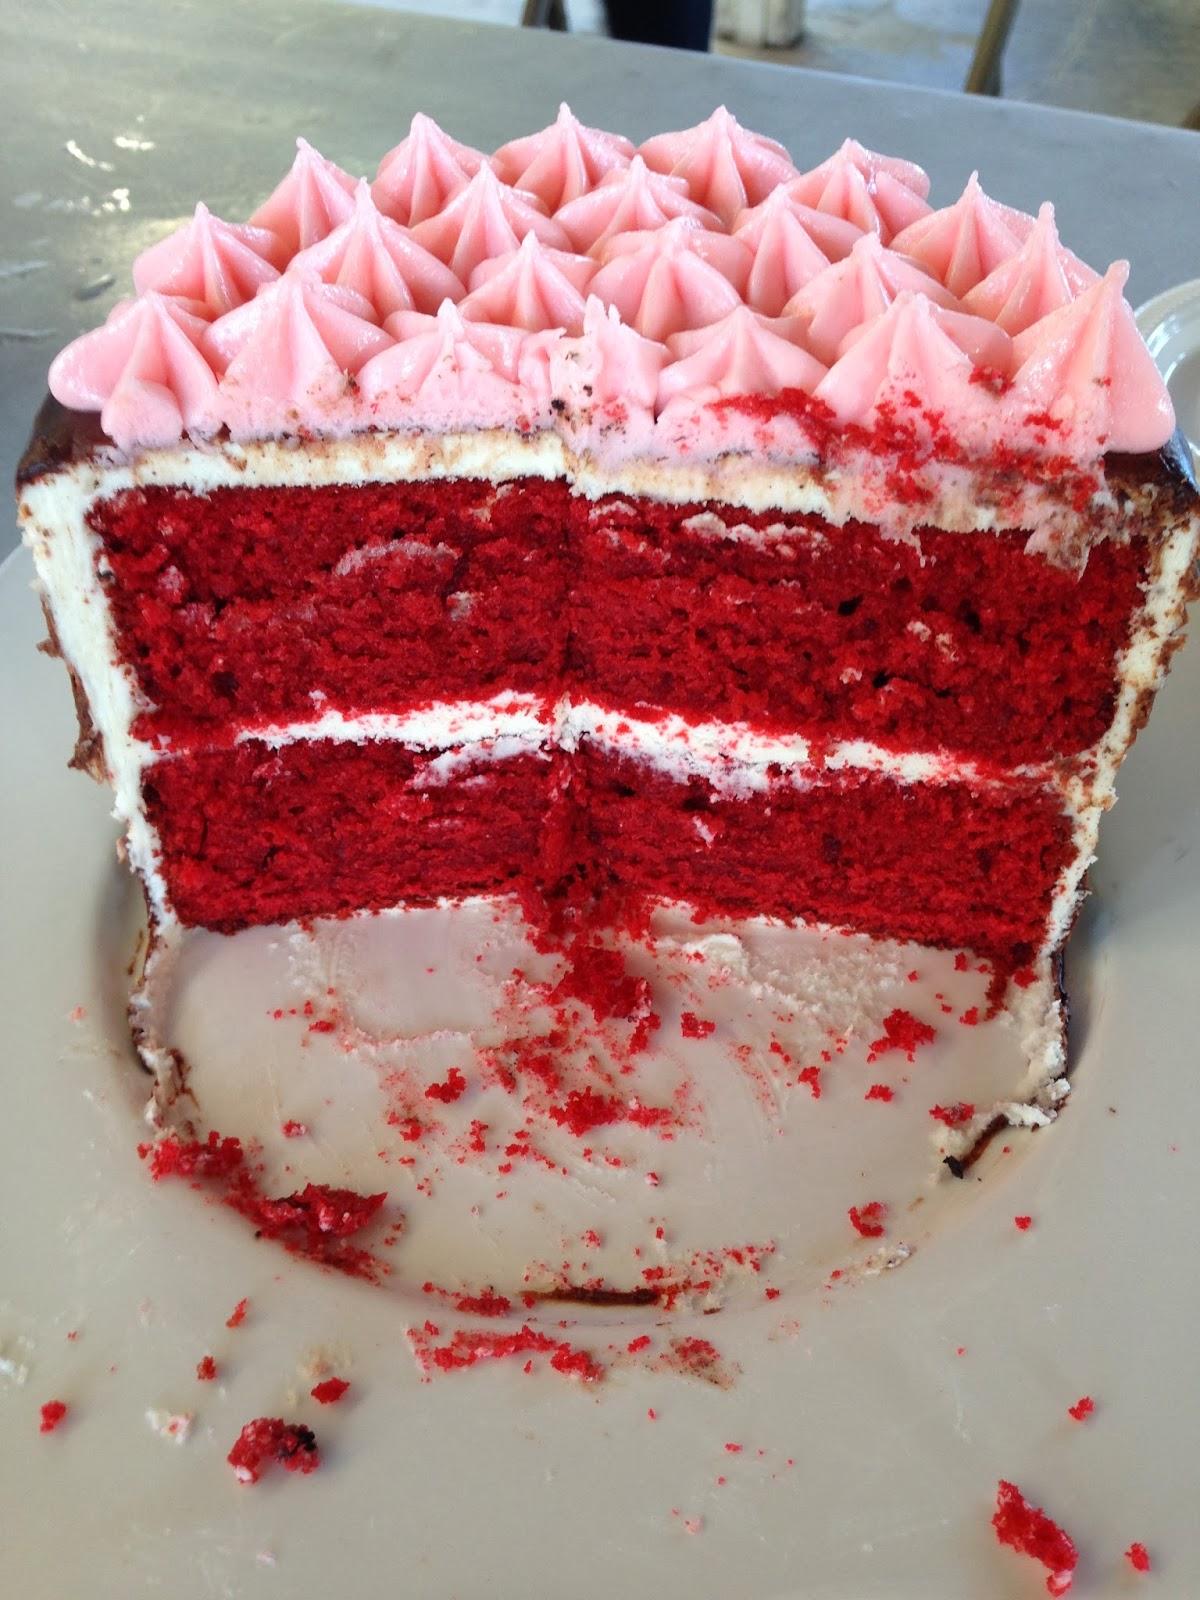 Laundry Cakes: Red Velvet Cupcake w/ White Chocolate Toblerone